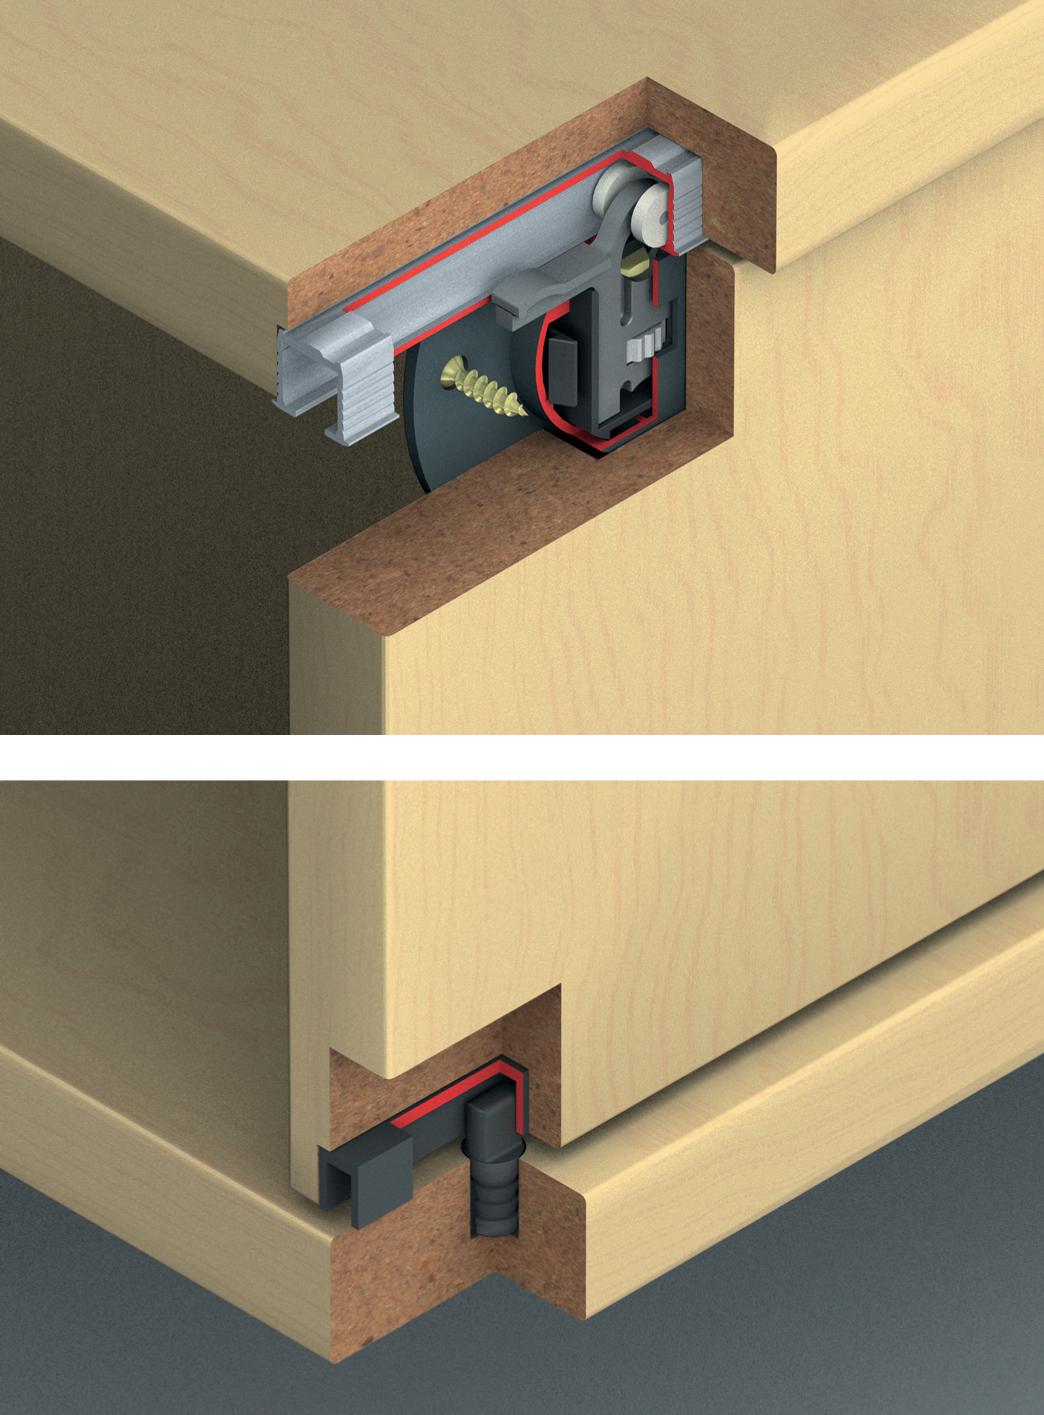 hafele inslide sliding door set 2 doors. Black Bedroom Furniture Sets. Home Design Ideas